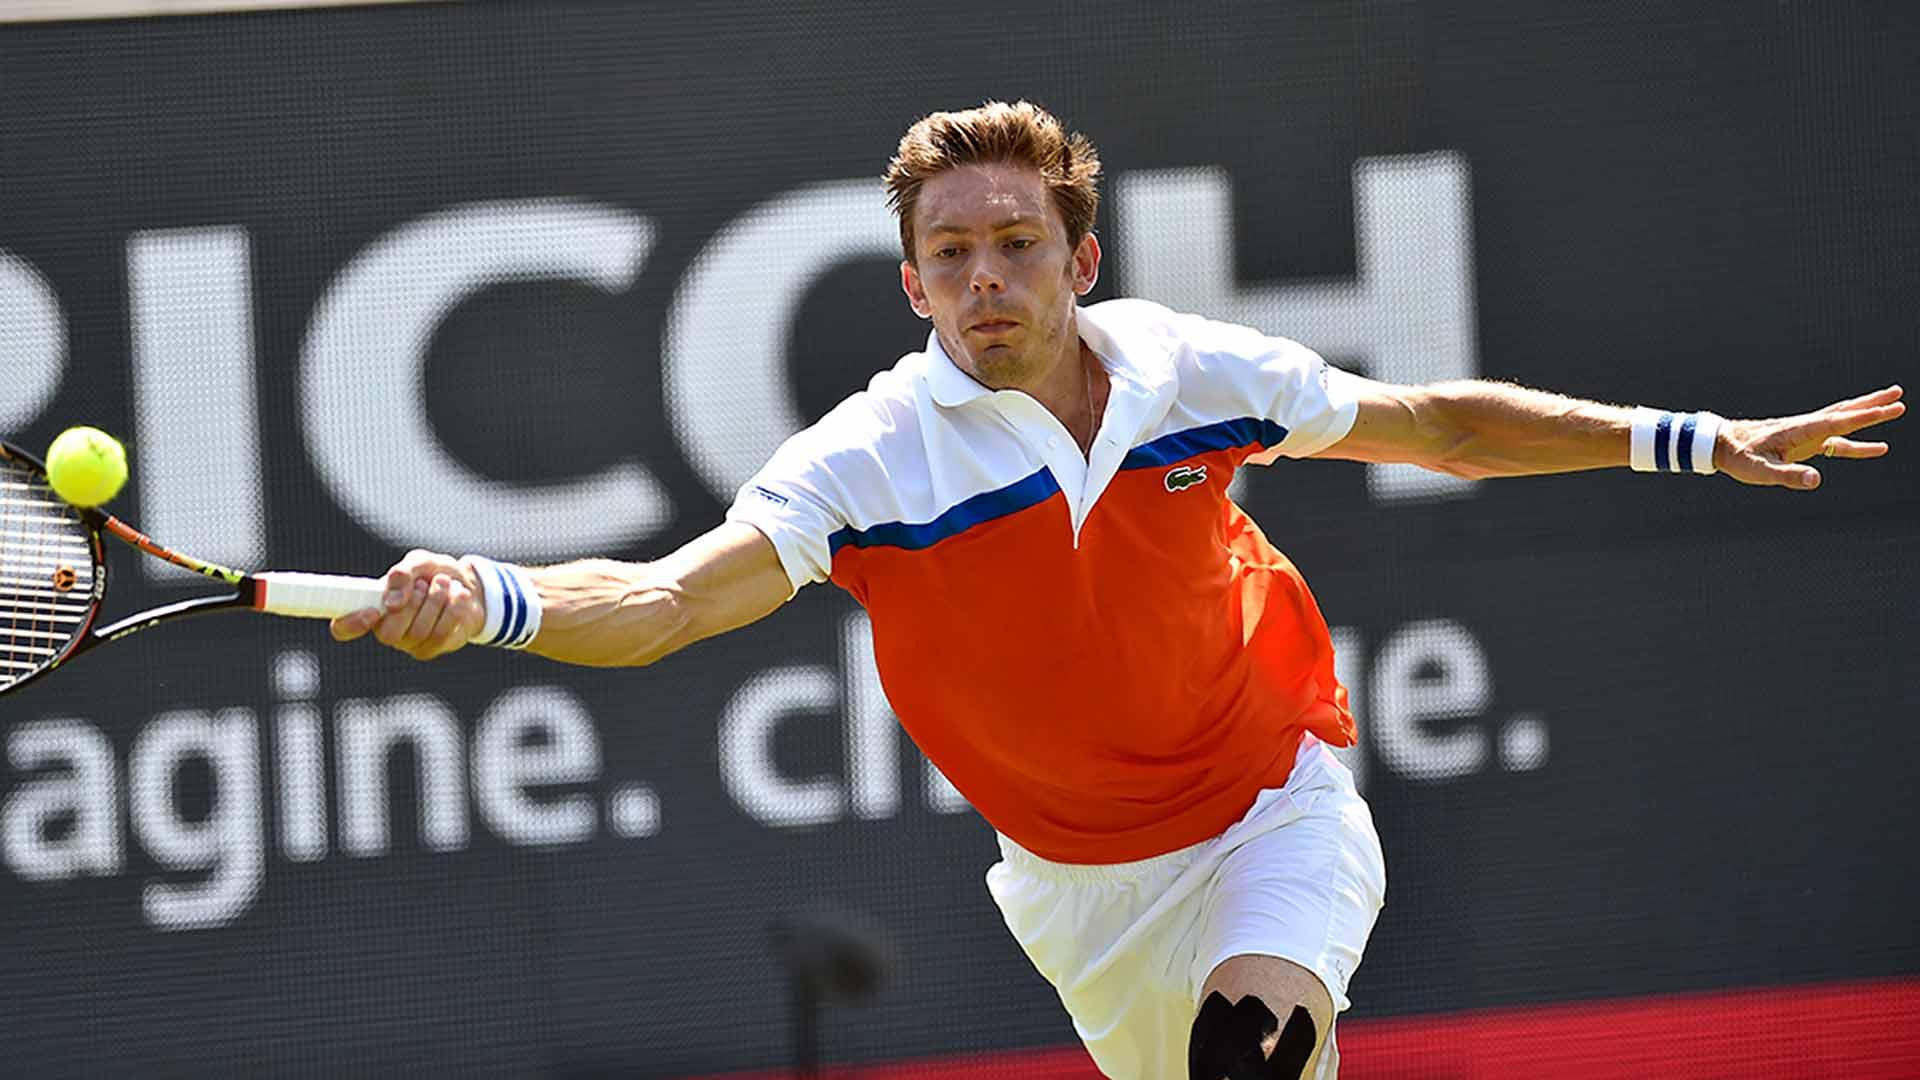 Ponturi Tenis Klein – Mahut – Wimbledon (GBR)